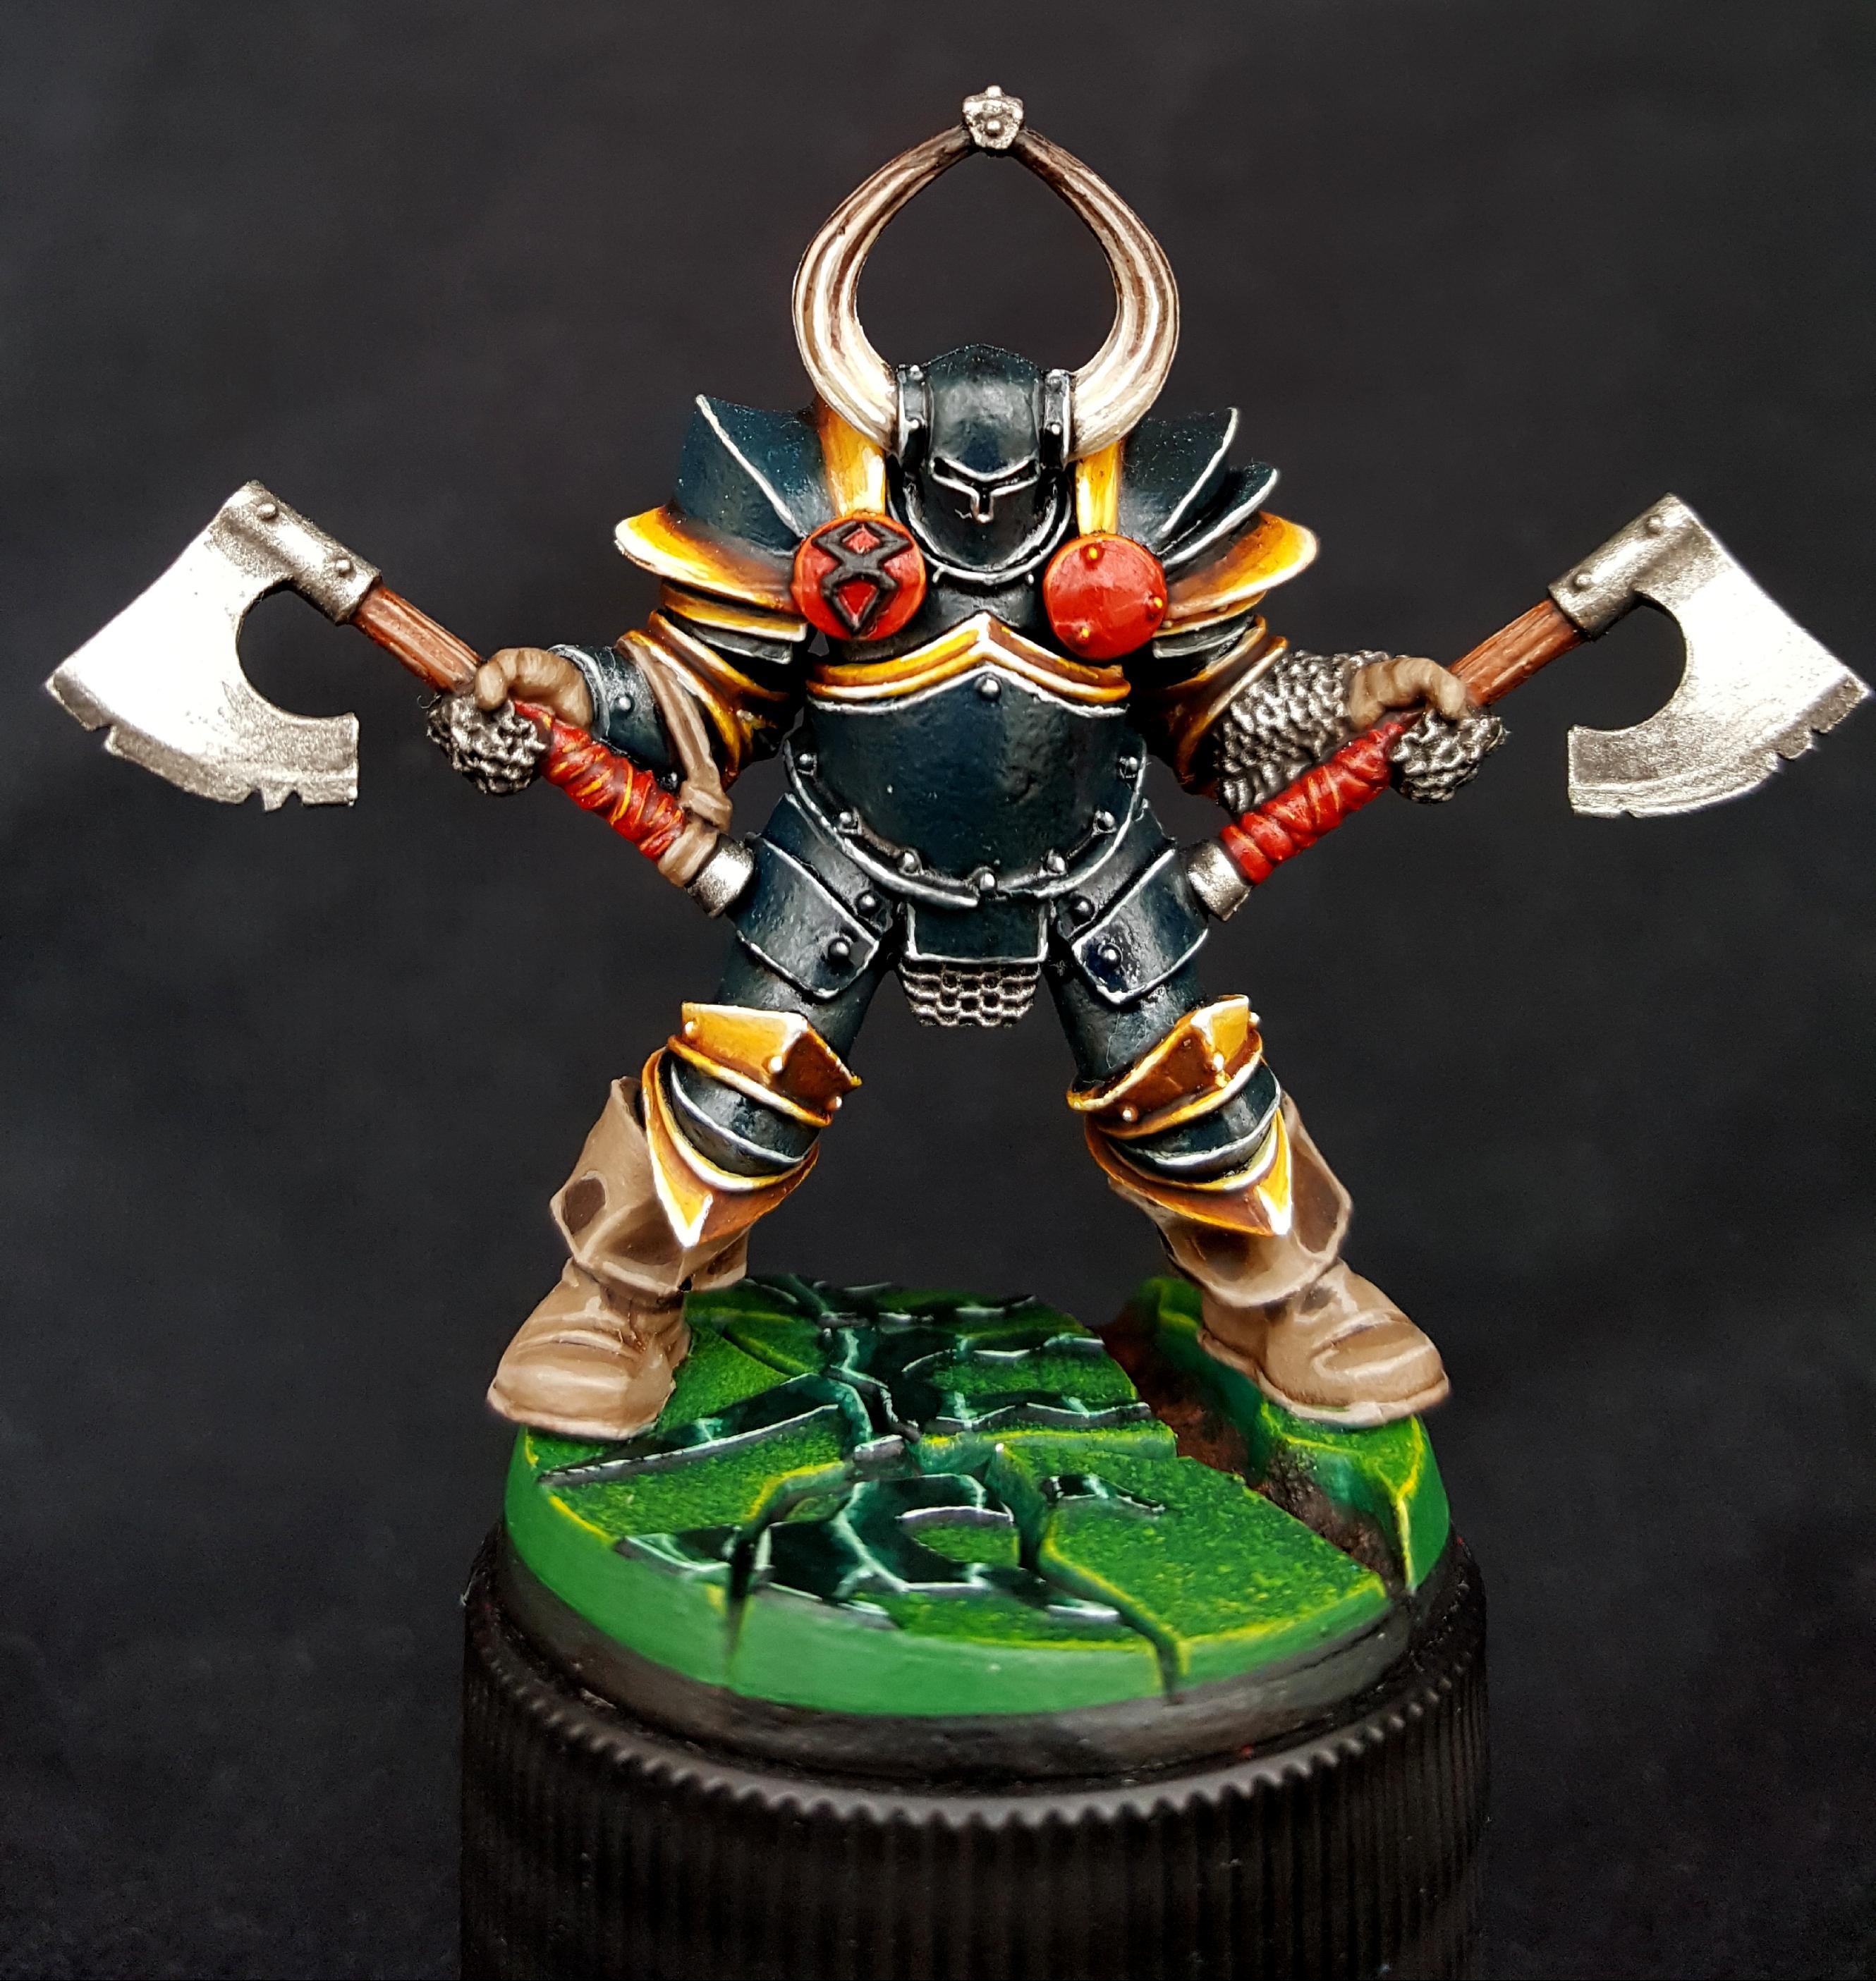 Age Of Sigmar, Chaos, Slaves To Darkness, Warhammer Fantasy